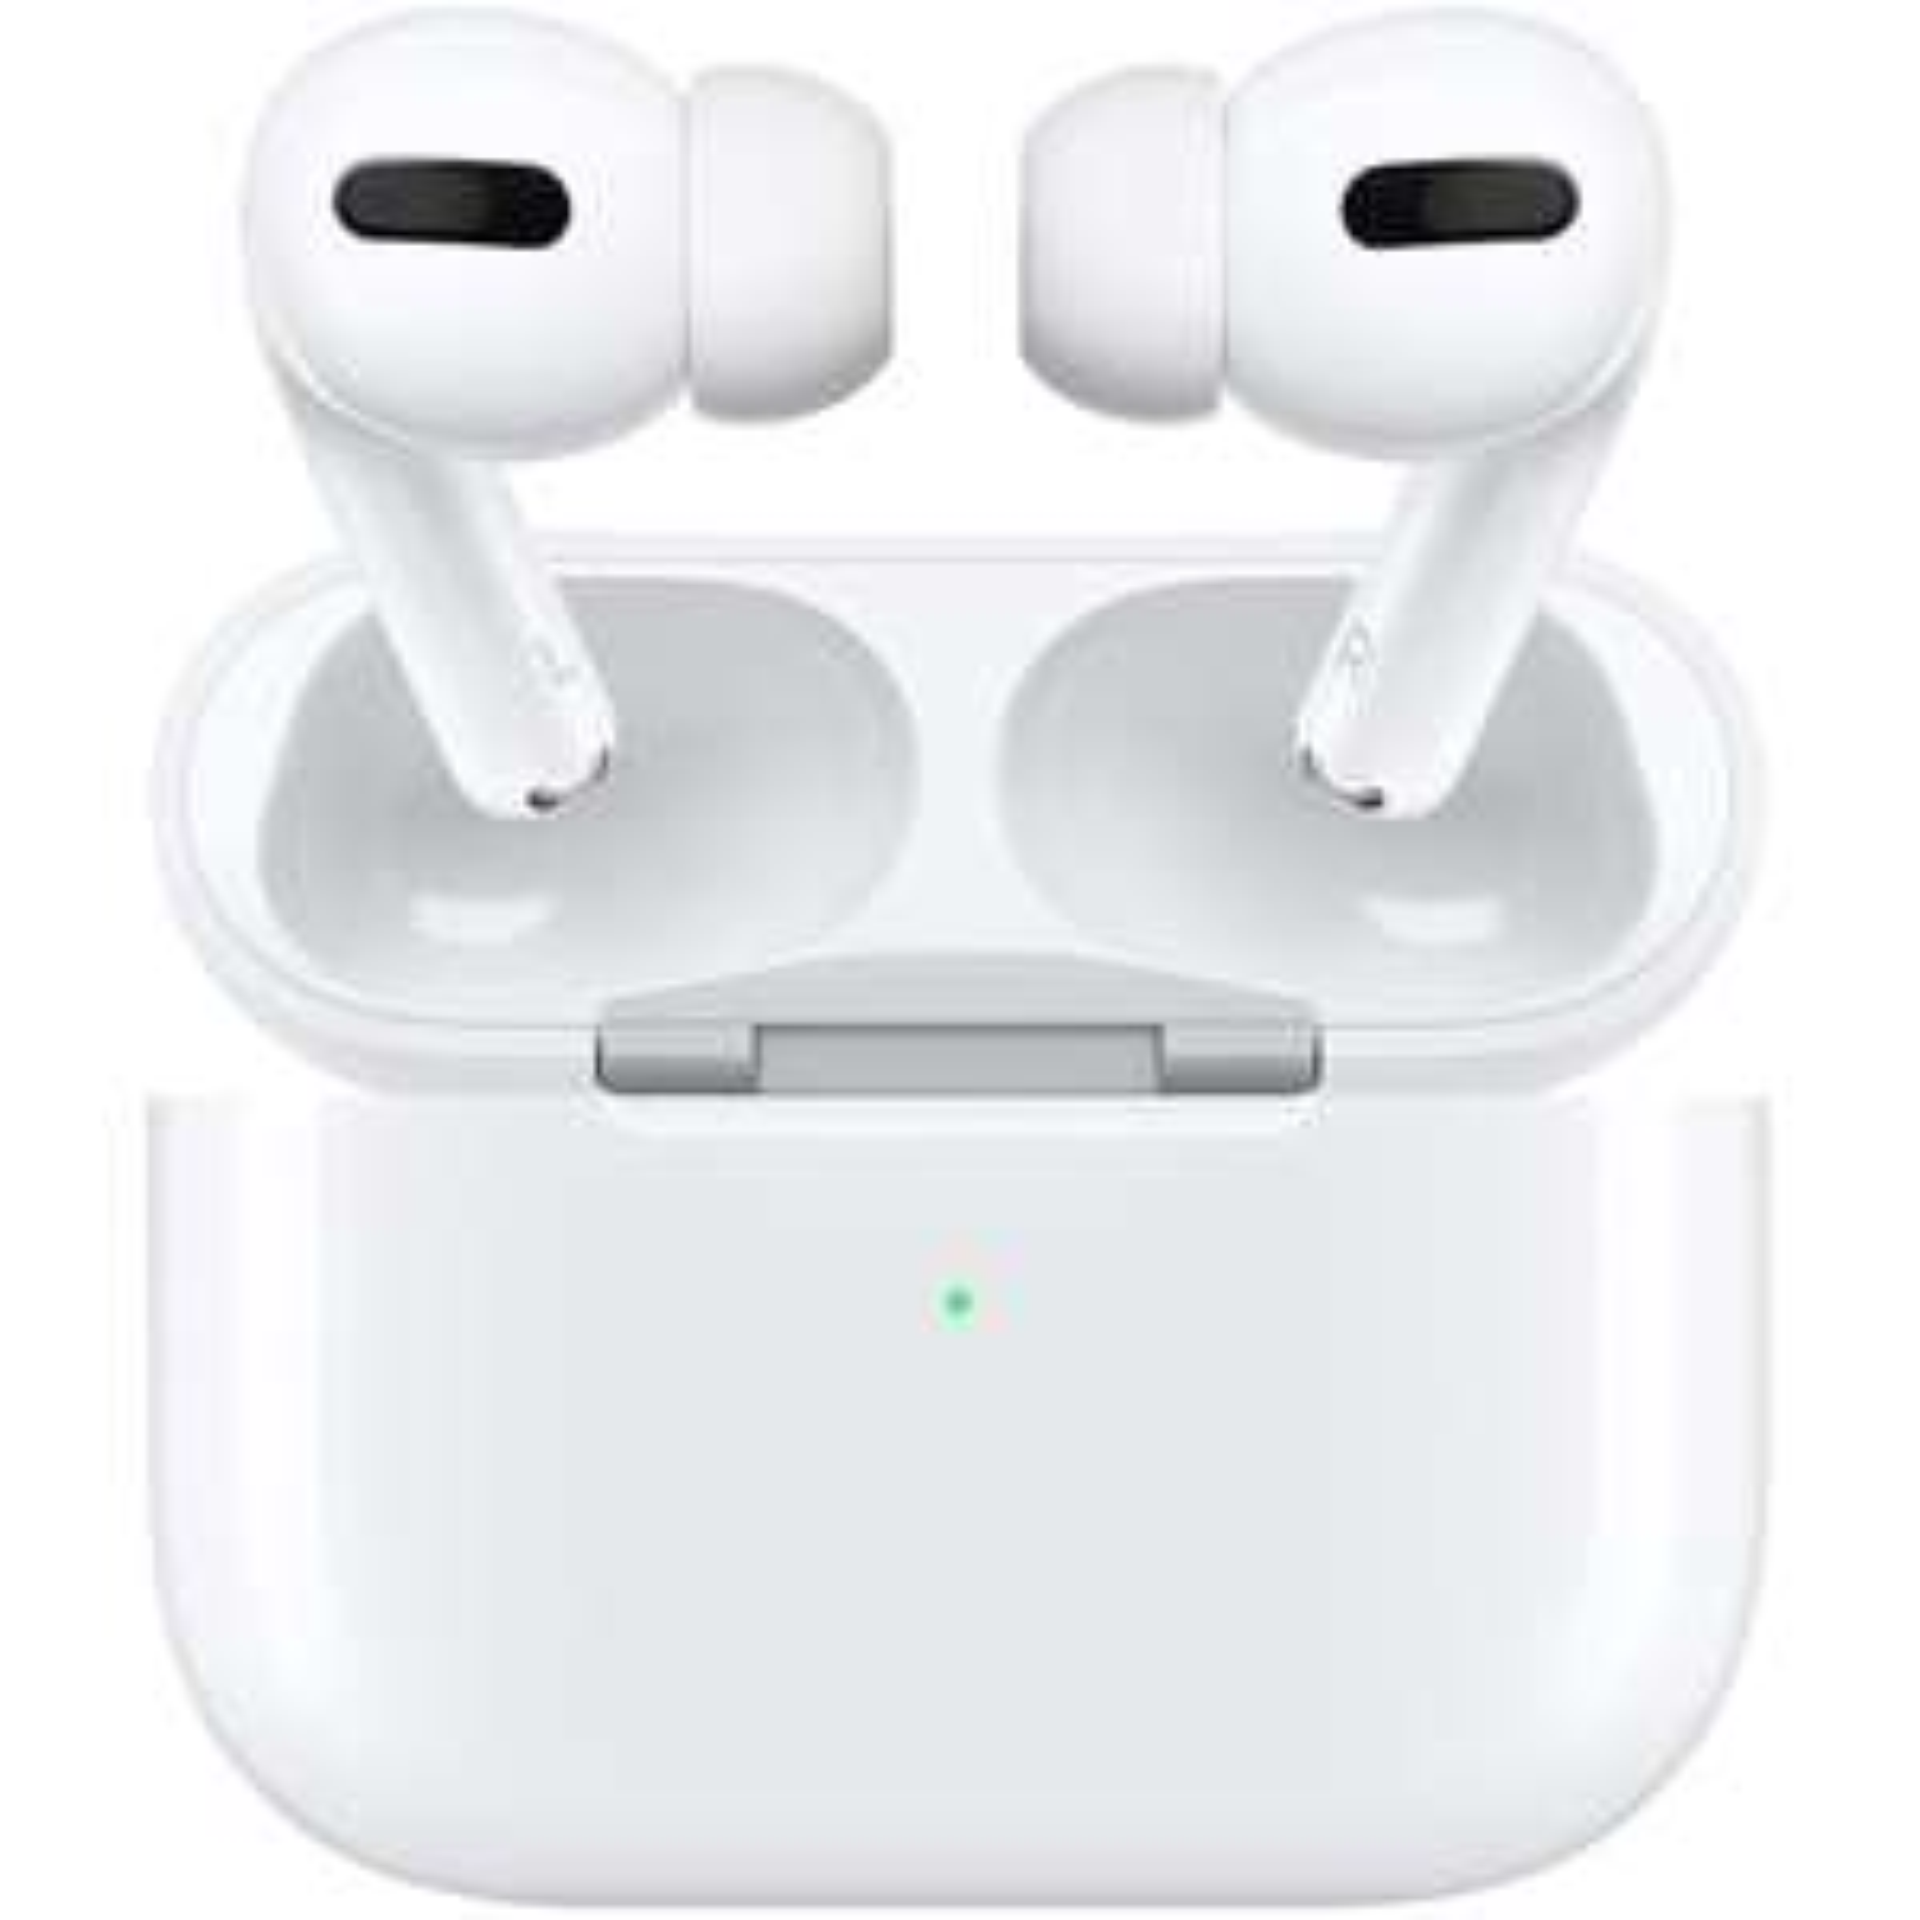 Apple AirPods Pro: Kabellose Kopfhörer mit Ladebox (Active Noise Cancelling, 4.5h Akku, 24h mit Ladebox, Wireless Charging, Lightning)